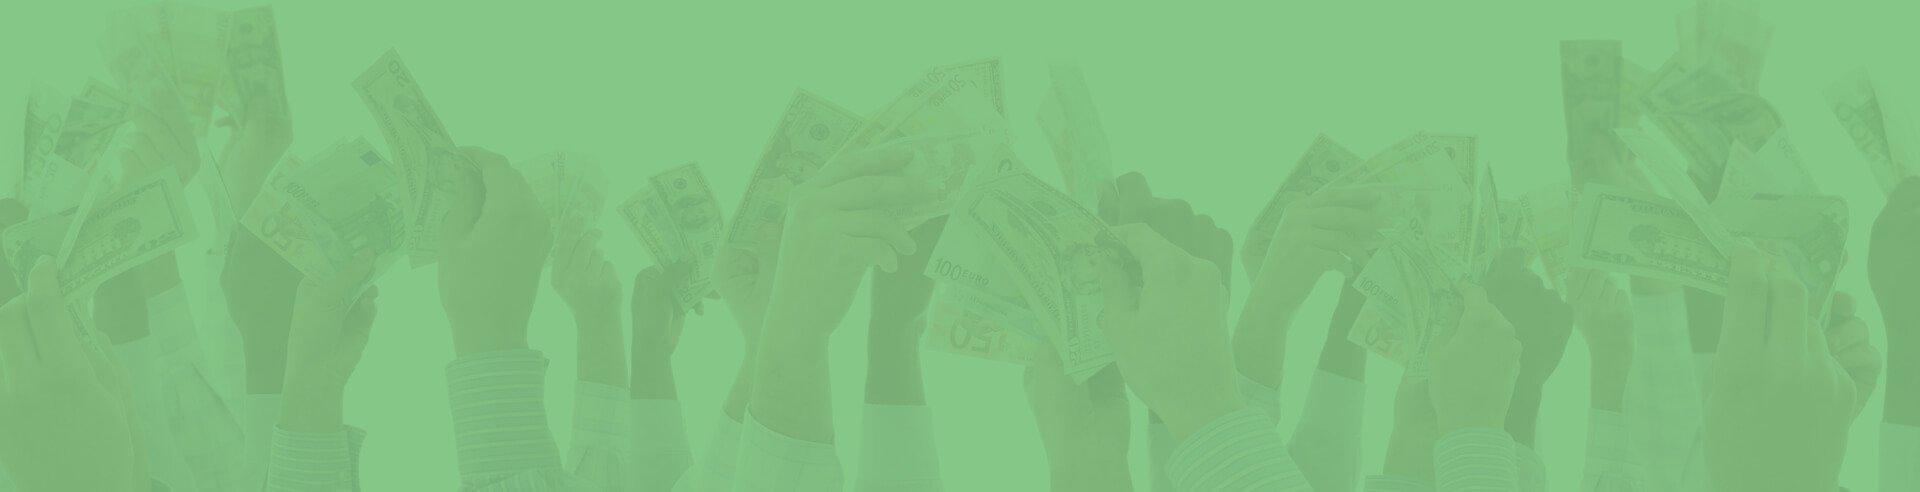 Equity Crowdfunding Script